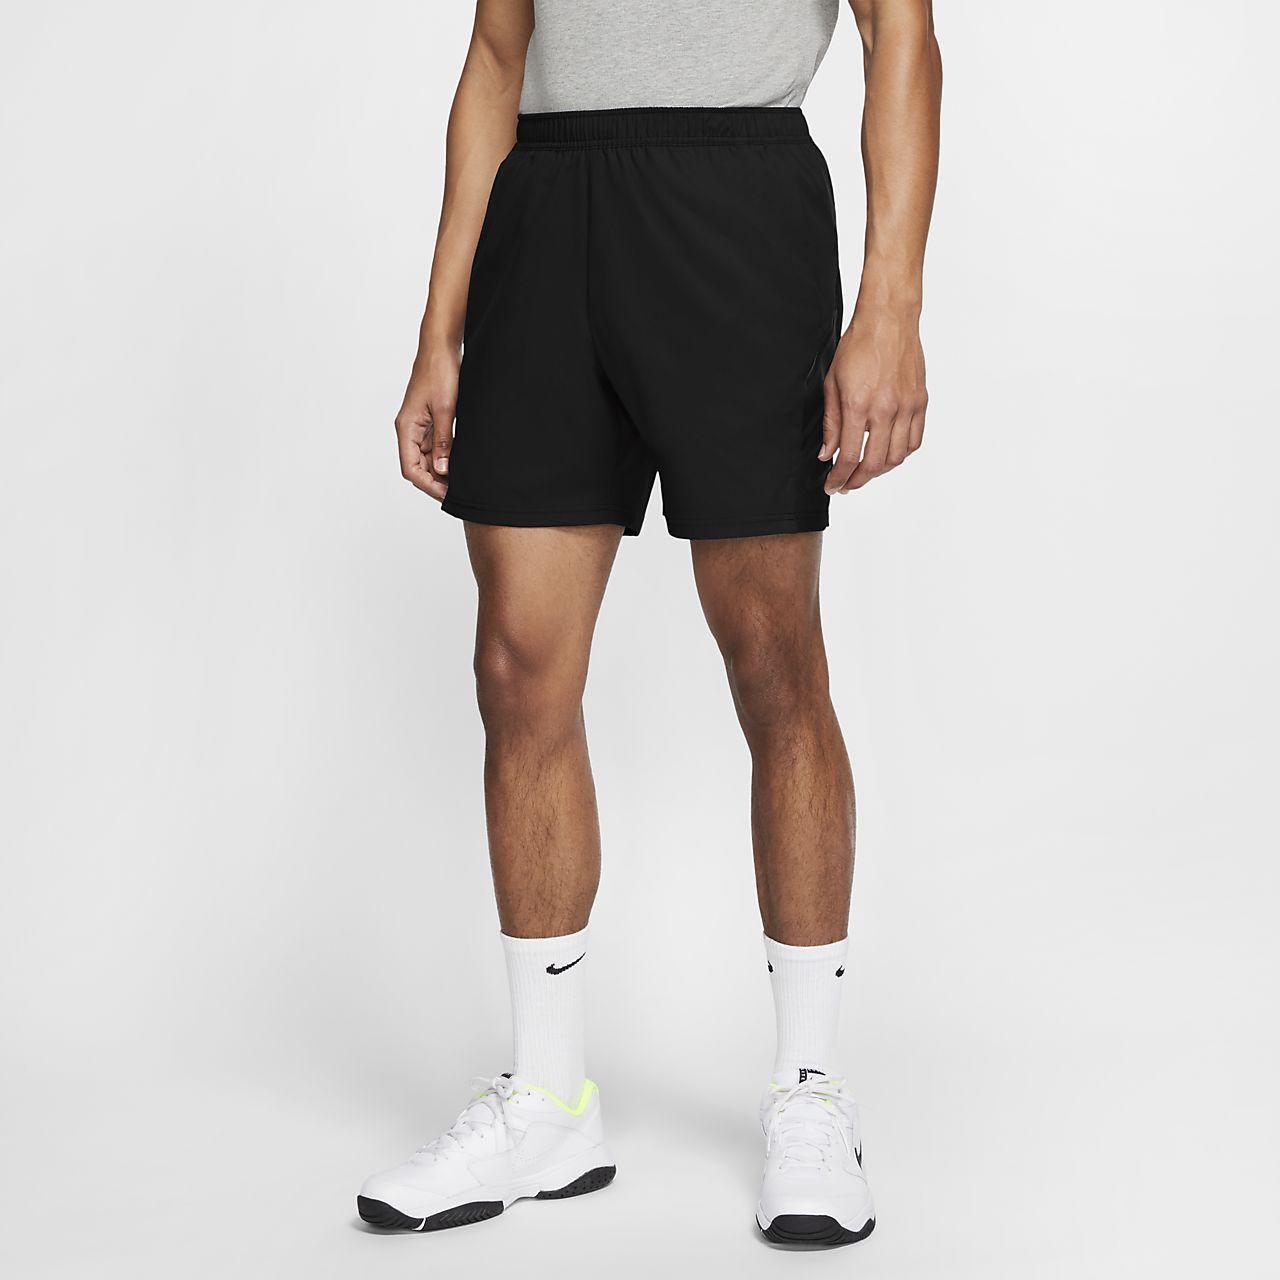 27c22b1ba7b77 nikecourt-dri-fit-tennisshorts-van-18-cm-heren-83Pd8F.jpg